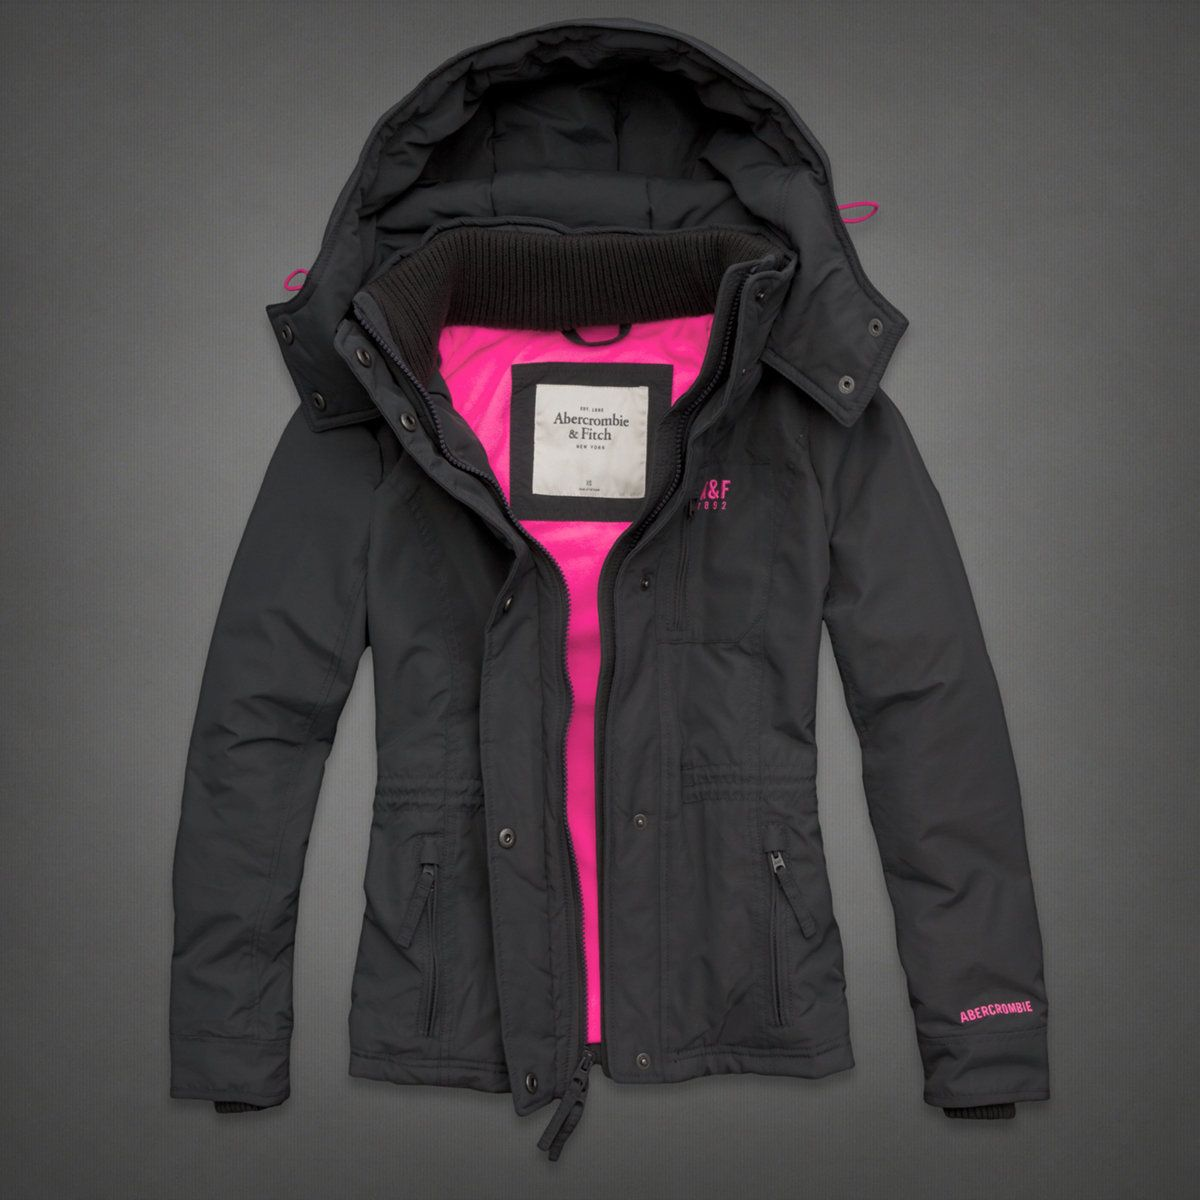 3 3 A Winter Pink Black Abercrombie Warriors Jacket Outerwear Women All Weather Jackets [ 1200 x 1200 Pixel ]